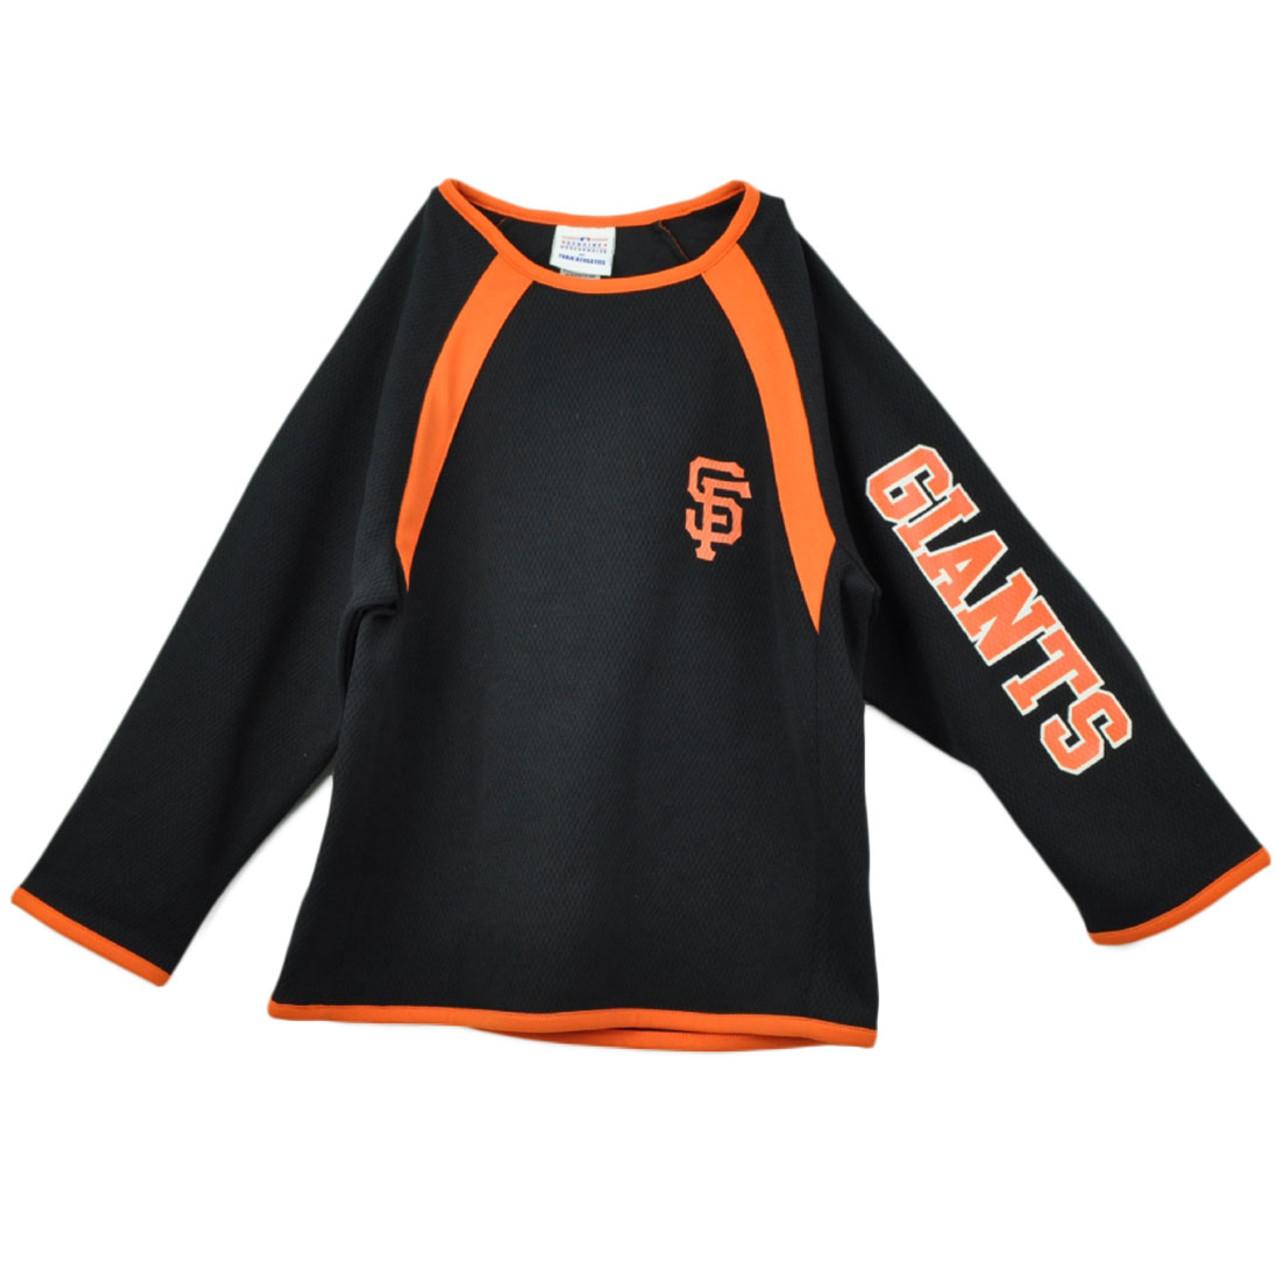 super popular b6e45 c85d2 MLB San Francisco Giants Long Sleeve Tshirt Youth Orange Black Crew Neck